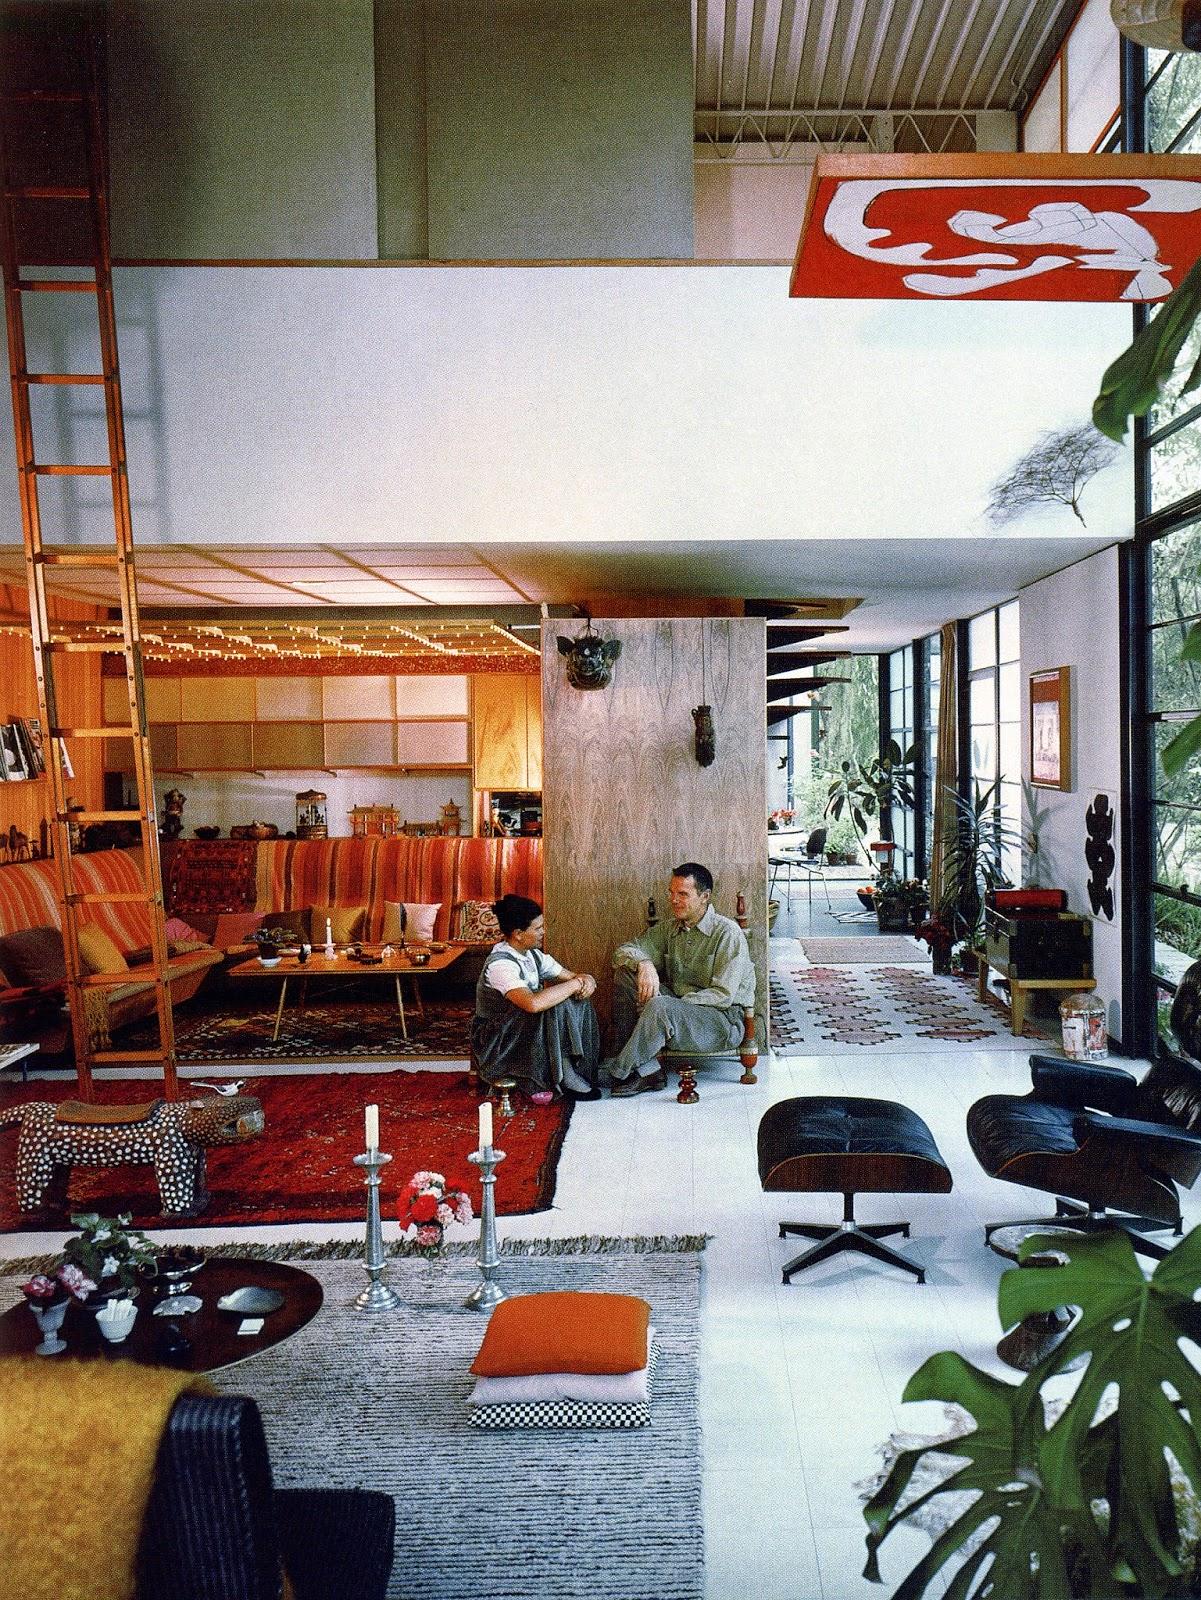 jpiarquitectura. Black Bedroom Furniture Sets. Home Design Ideas